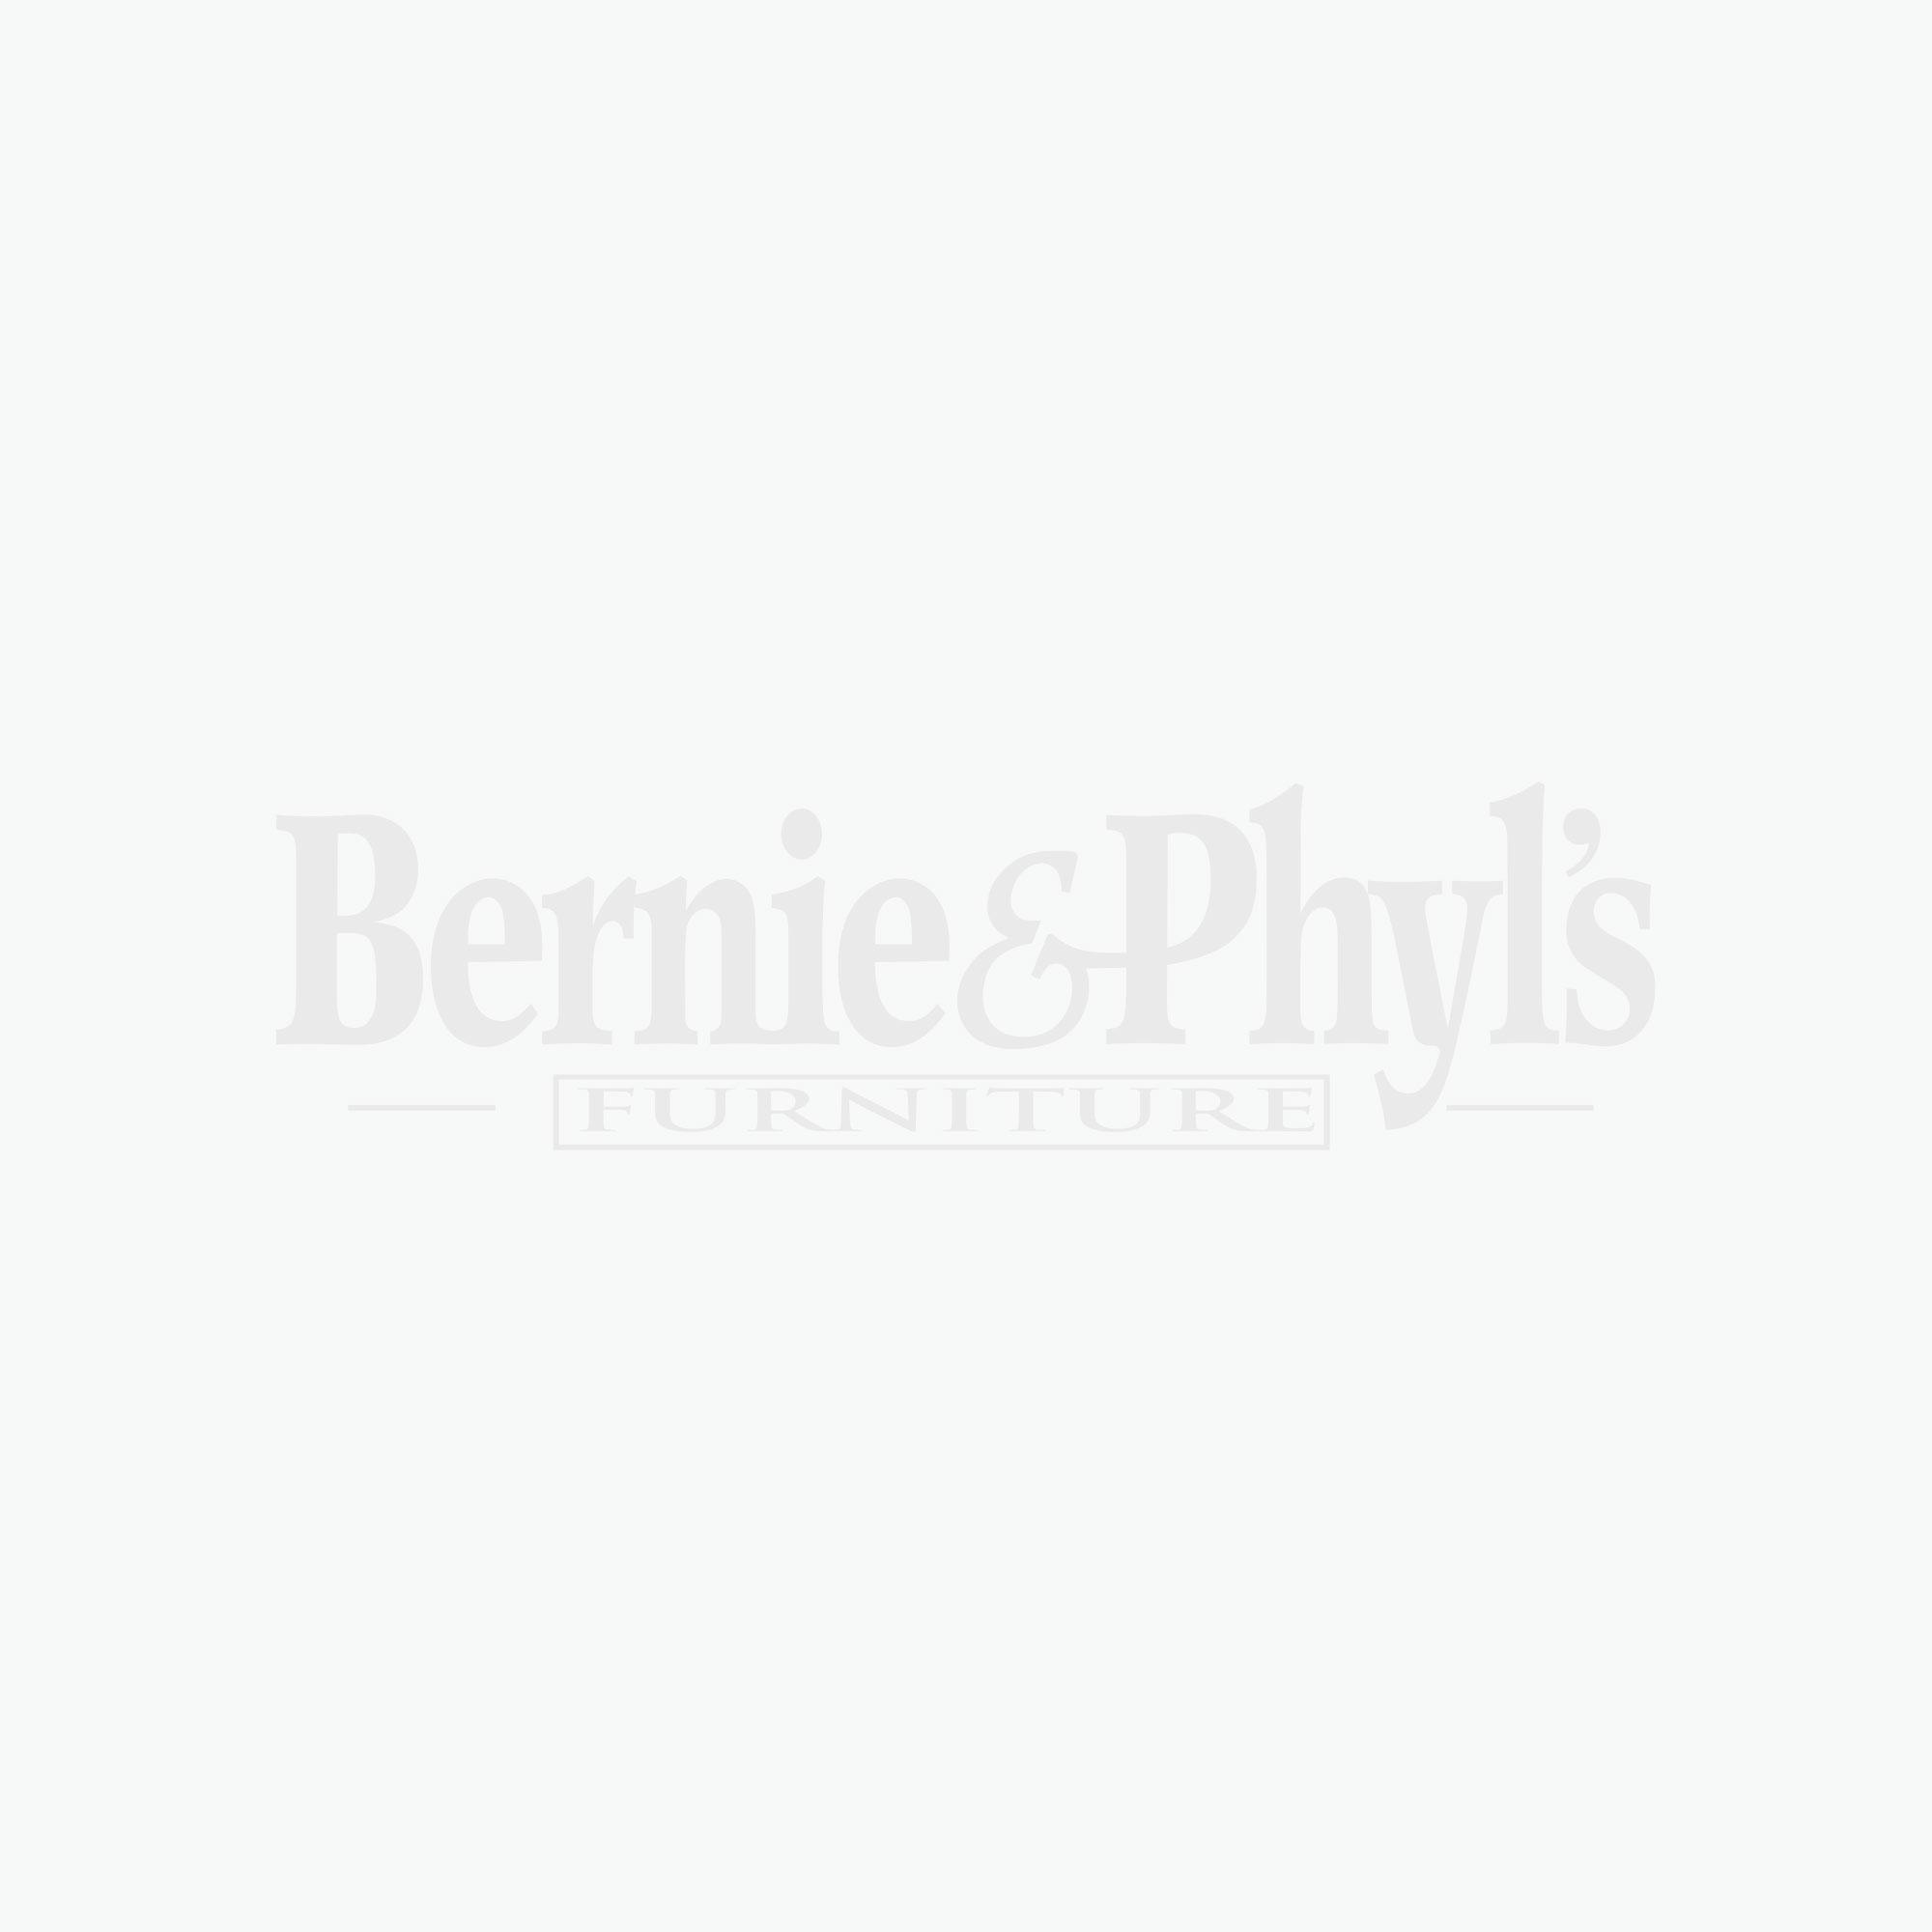 Barsheba King Duvet Cover Set - Ivory - (Set of 1) - Q259003K by Ashley Furniture Signature Design